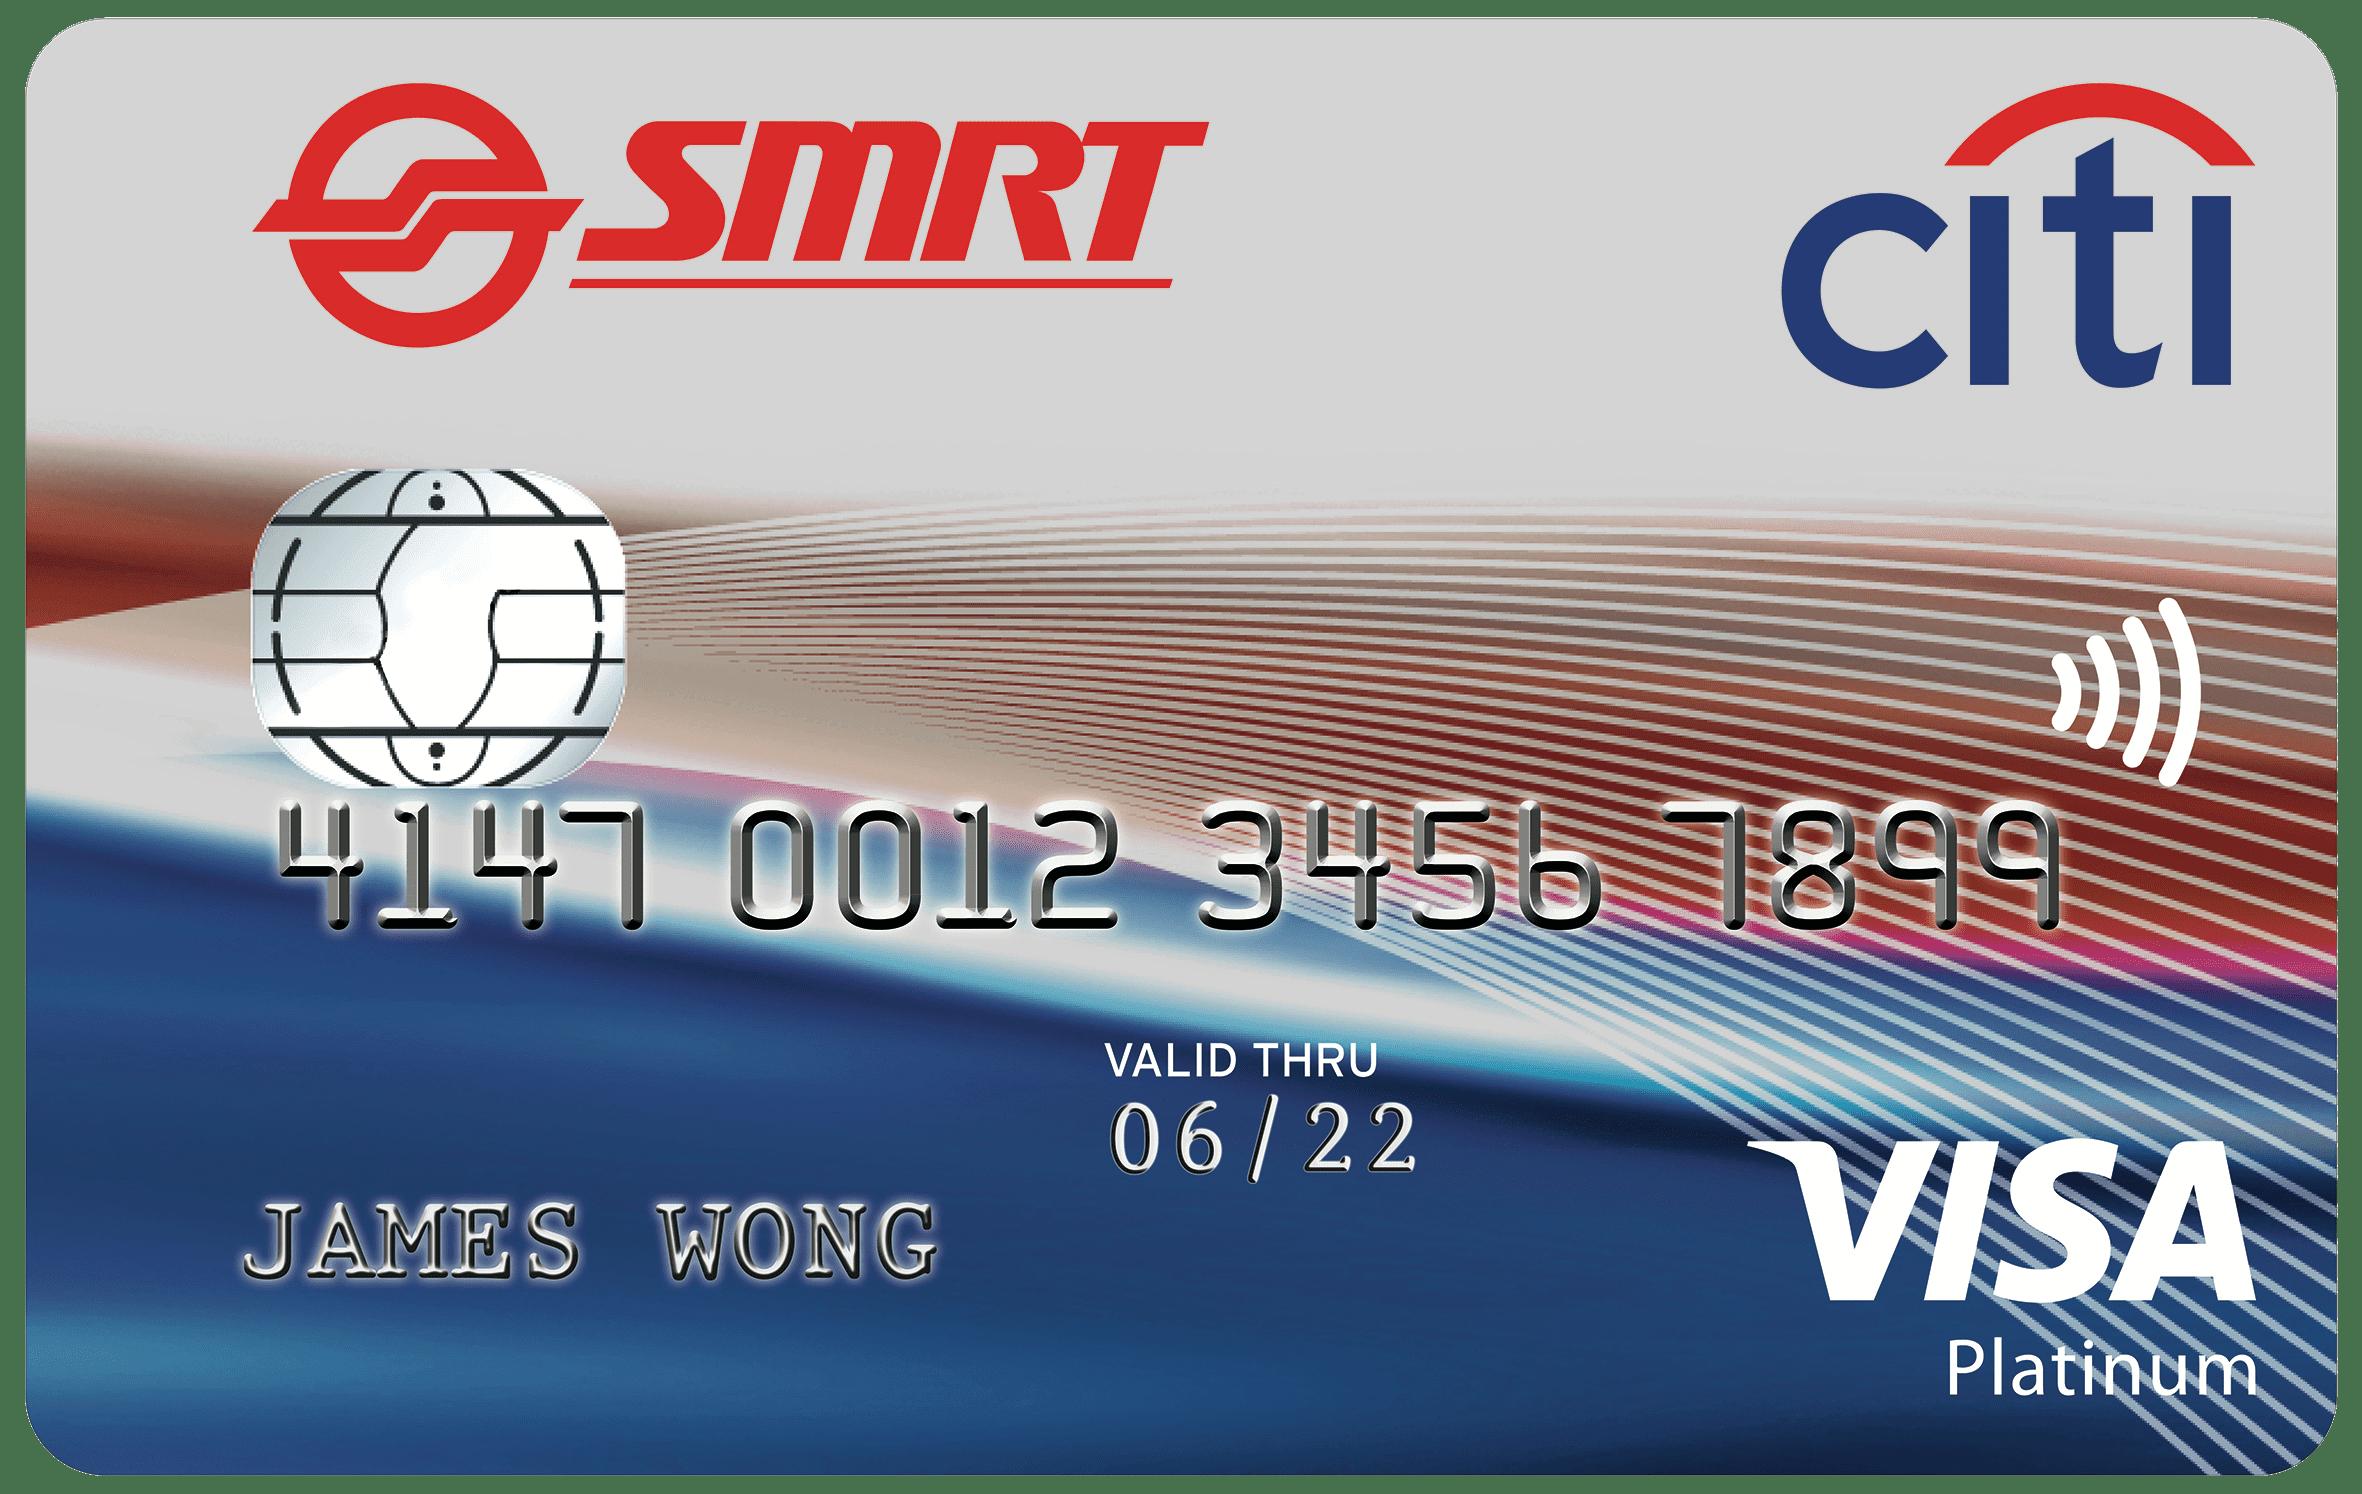 Citibank Smrt Credit Card Singapore 2018 Credit Card